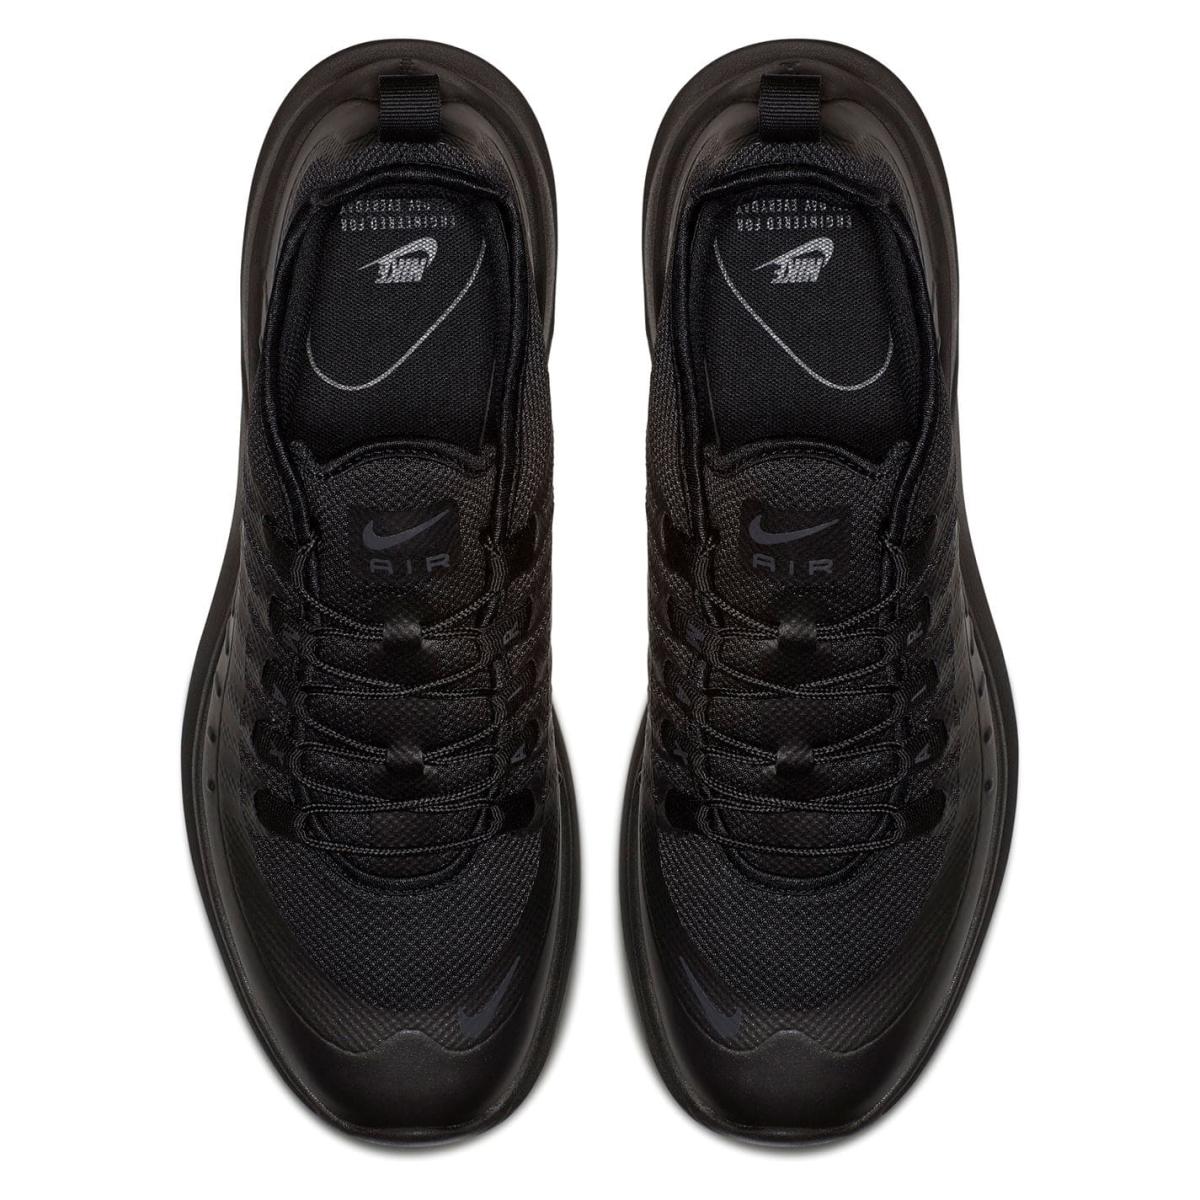 NIKE-Air-Max-Axis-Scarpe-da-ginnastica-Scarpe-da-Corsa-Uomo-Sneaker-Scarpe-Sportive-Fitness-1313 miniatura 4